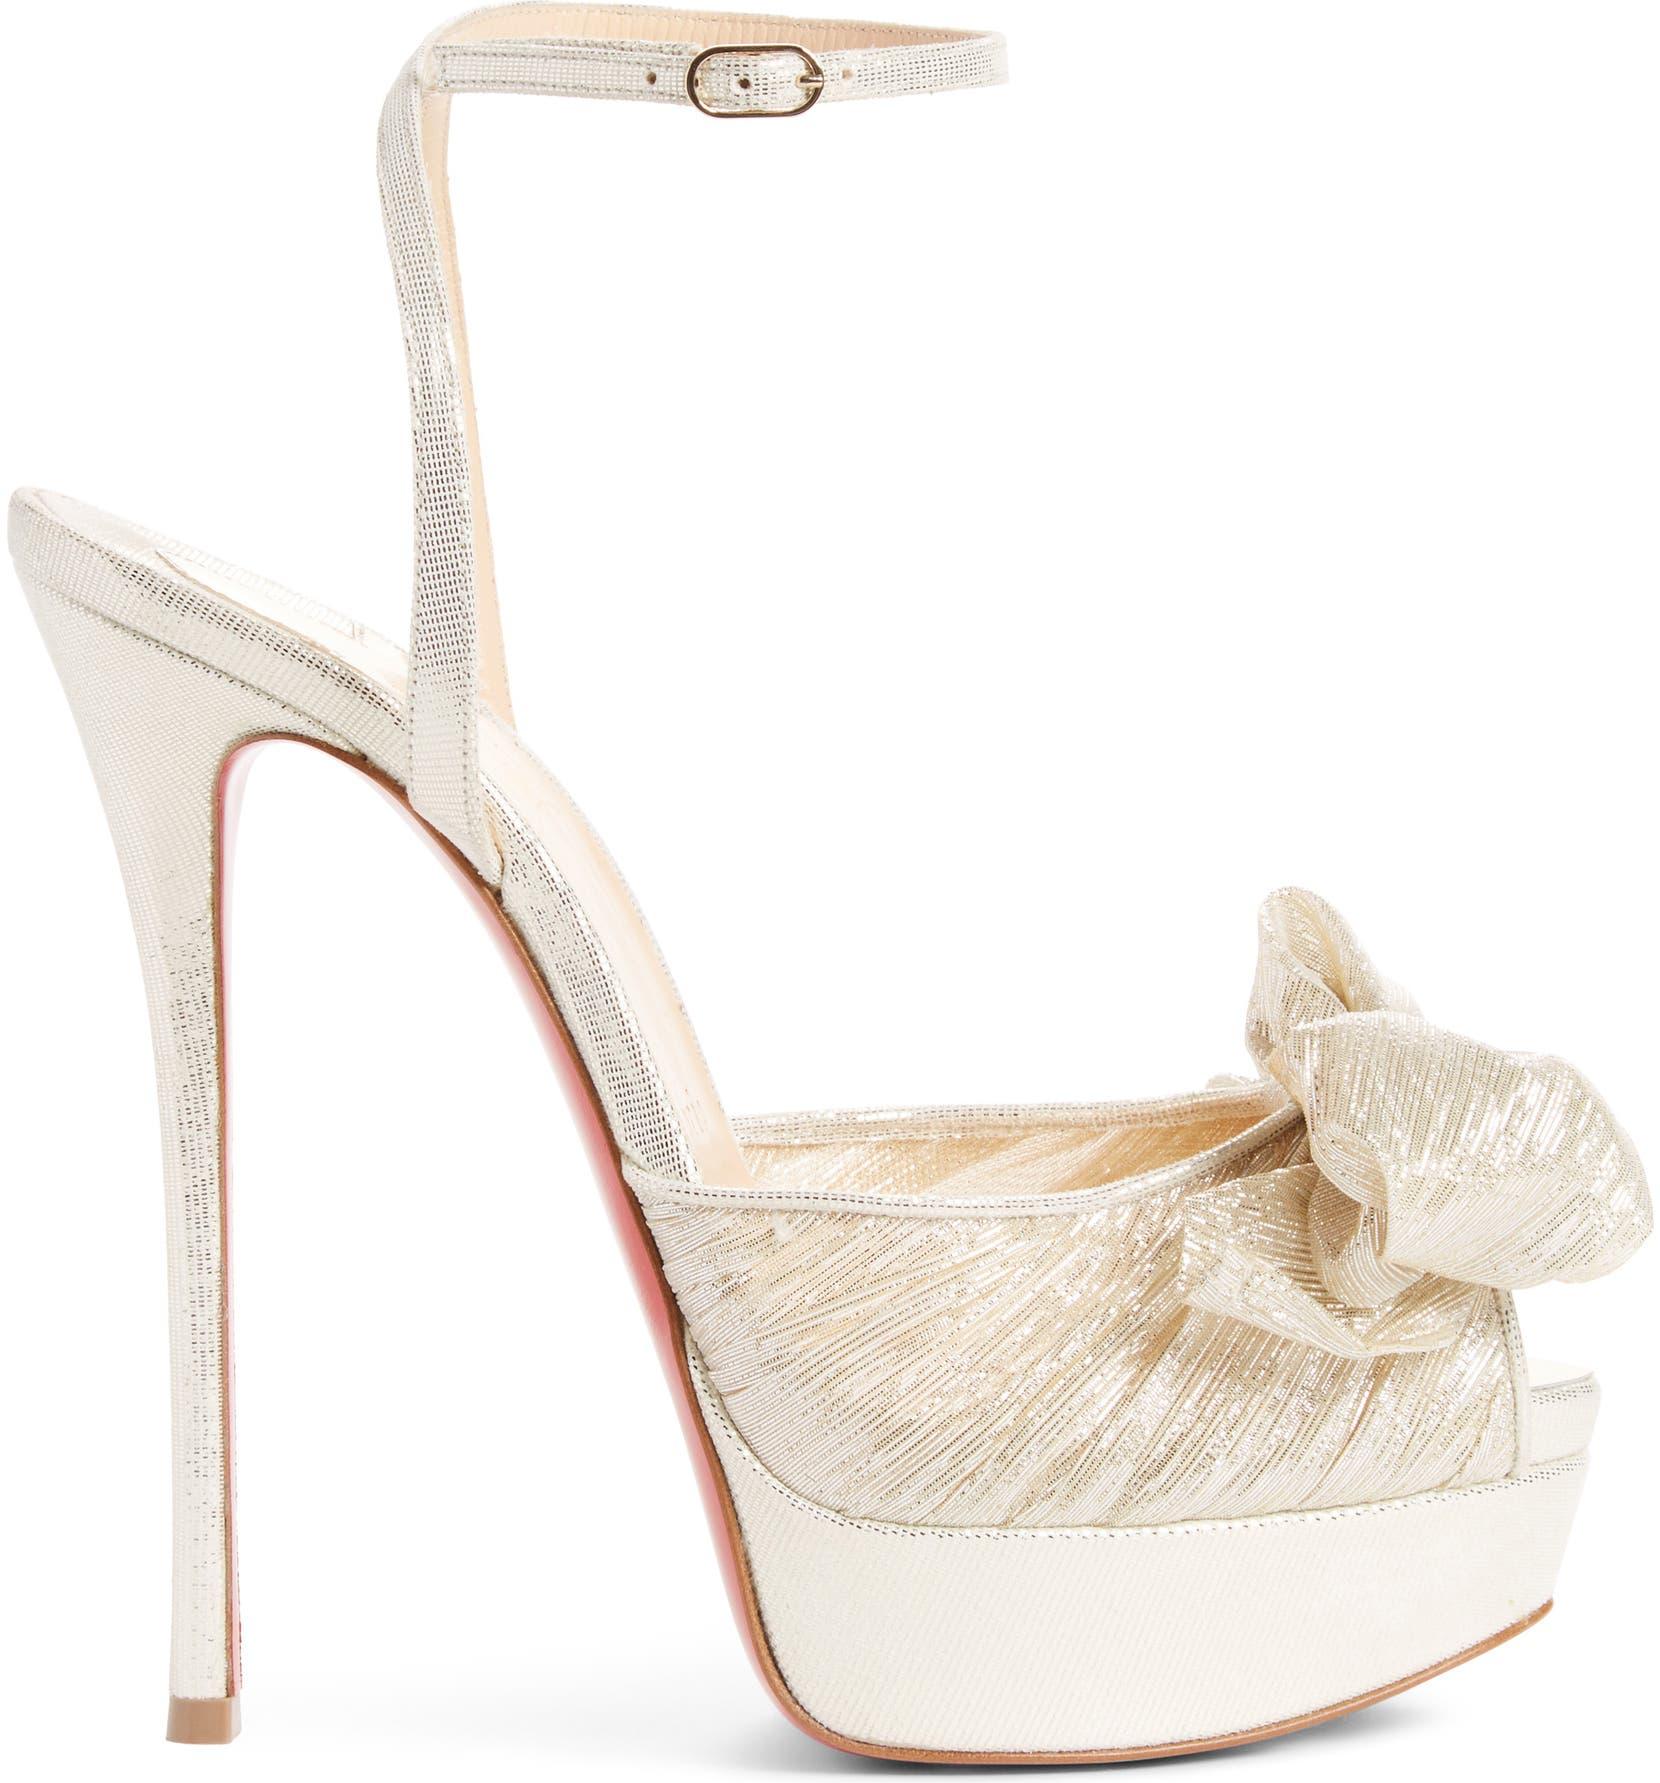 6dad61958e9 Christian Louboutin Artydiva Platform Ankle Strap Sandal (Women ...